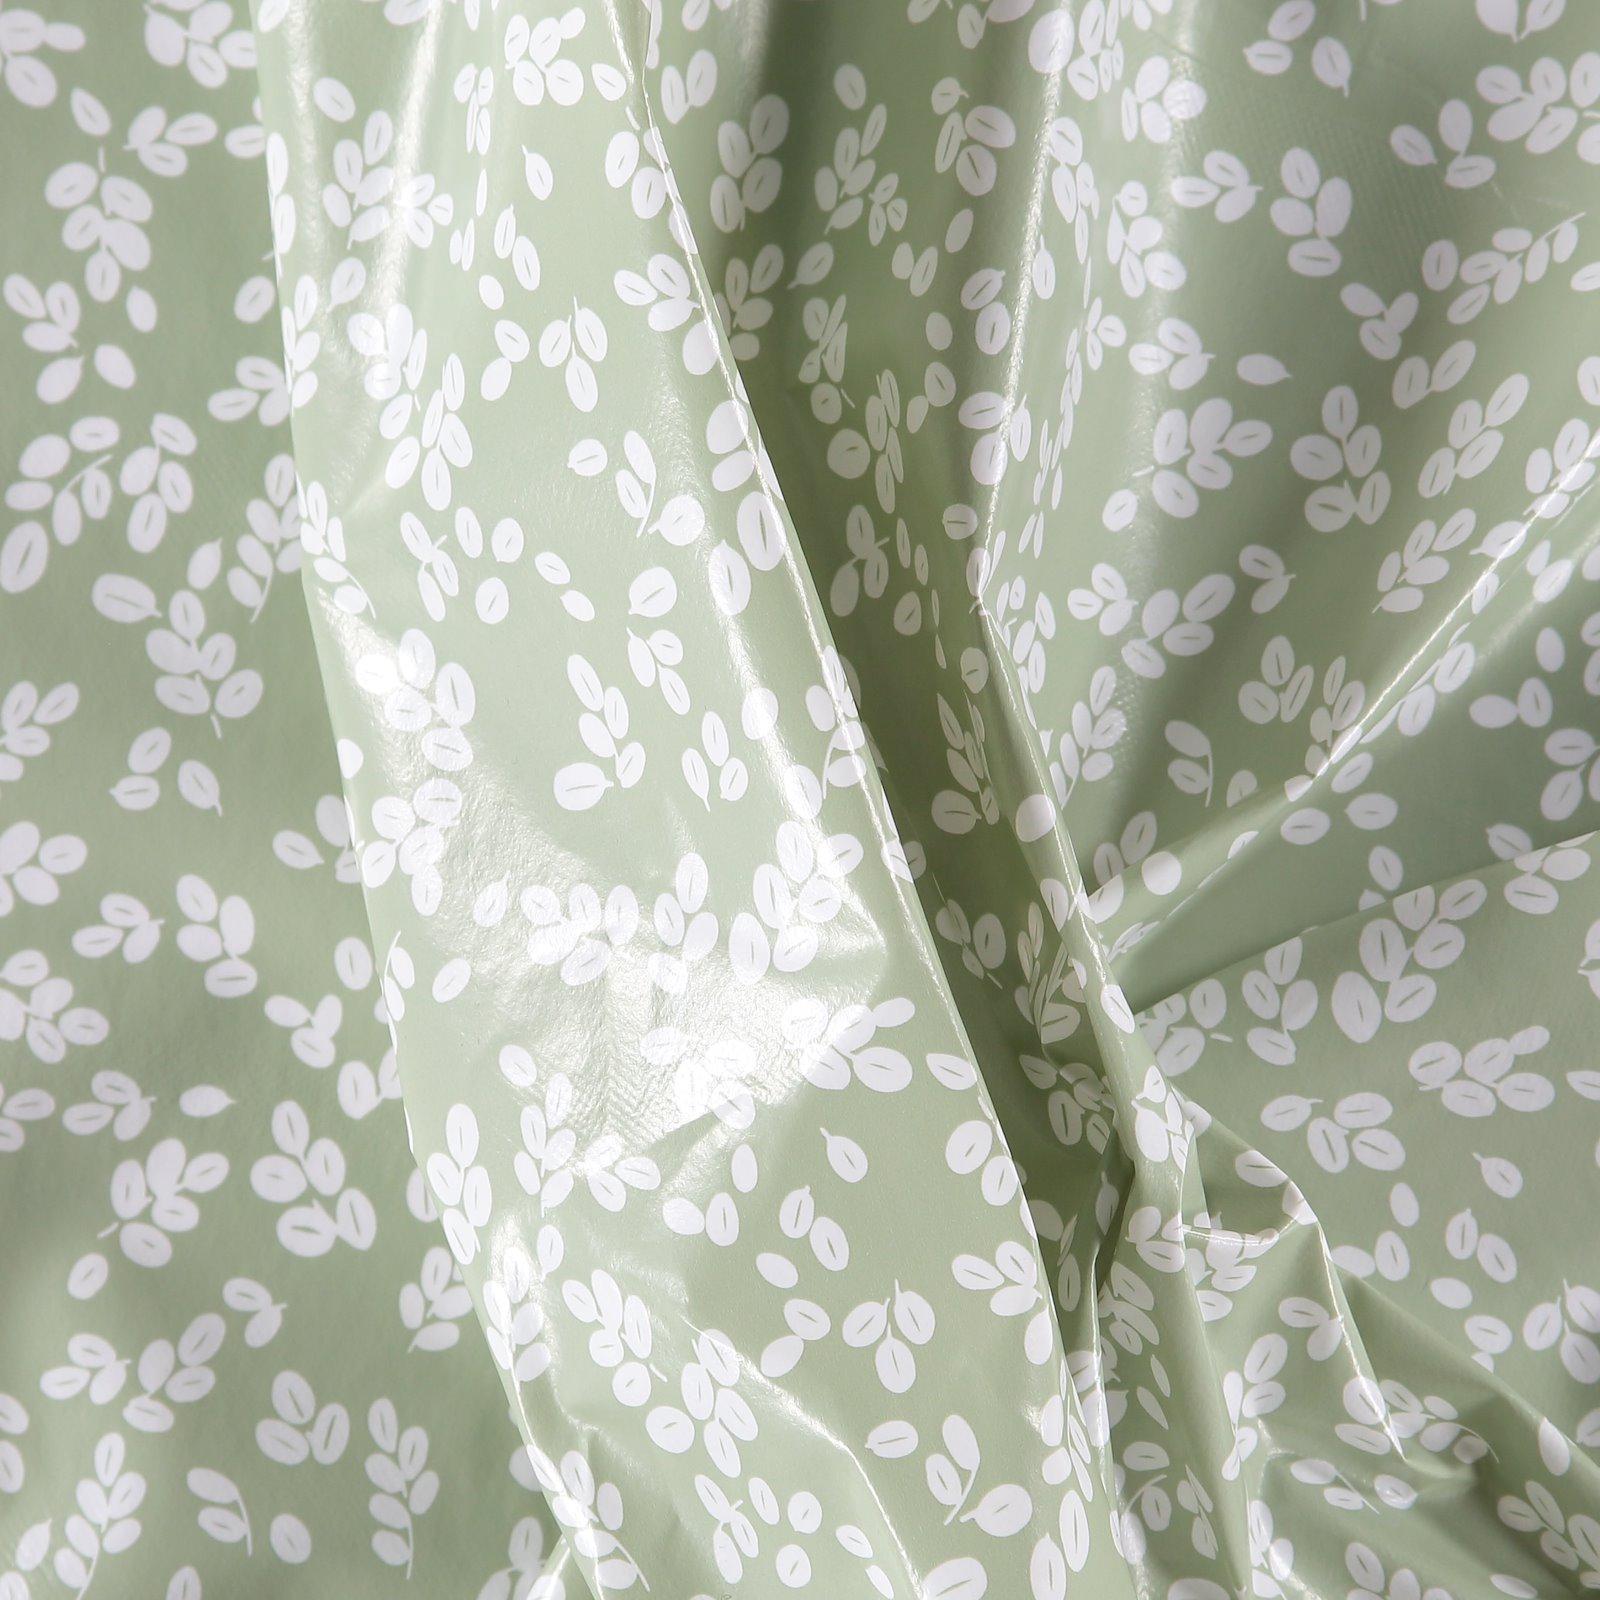 Non-woven oilcloth green w white leaves